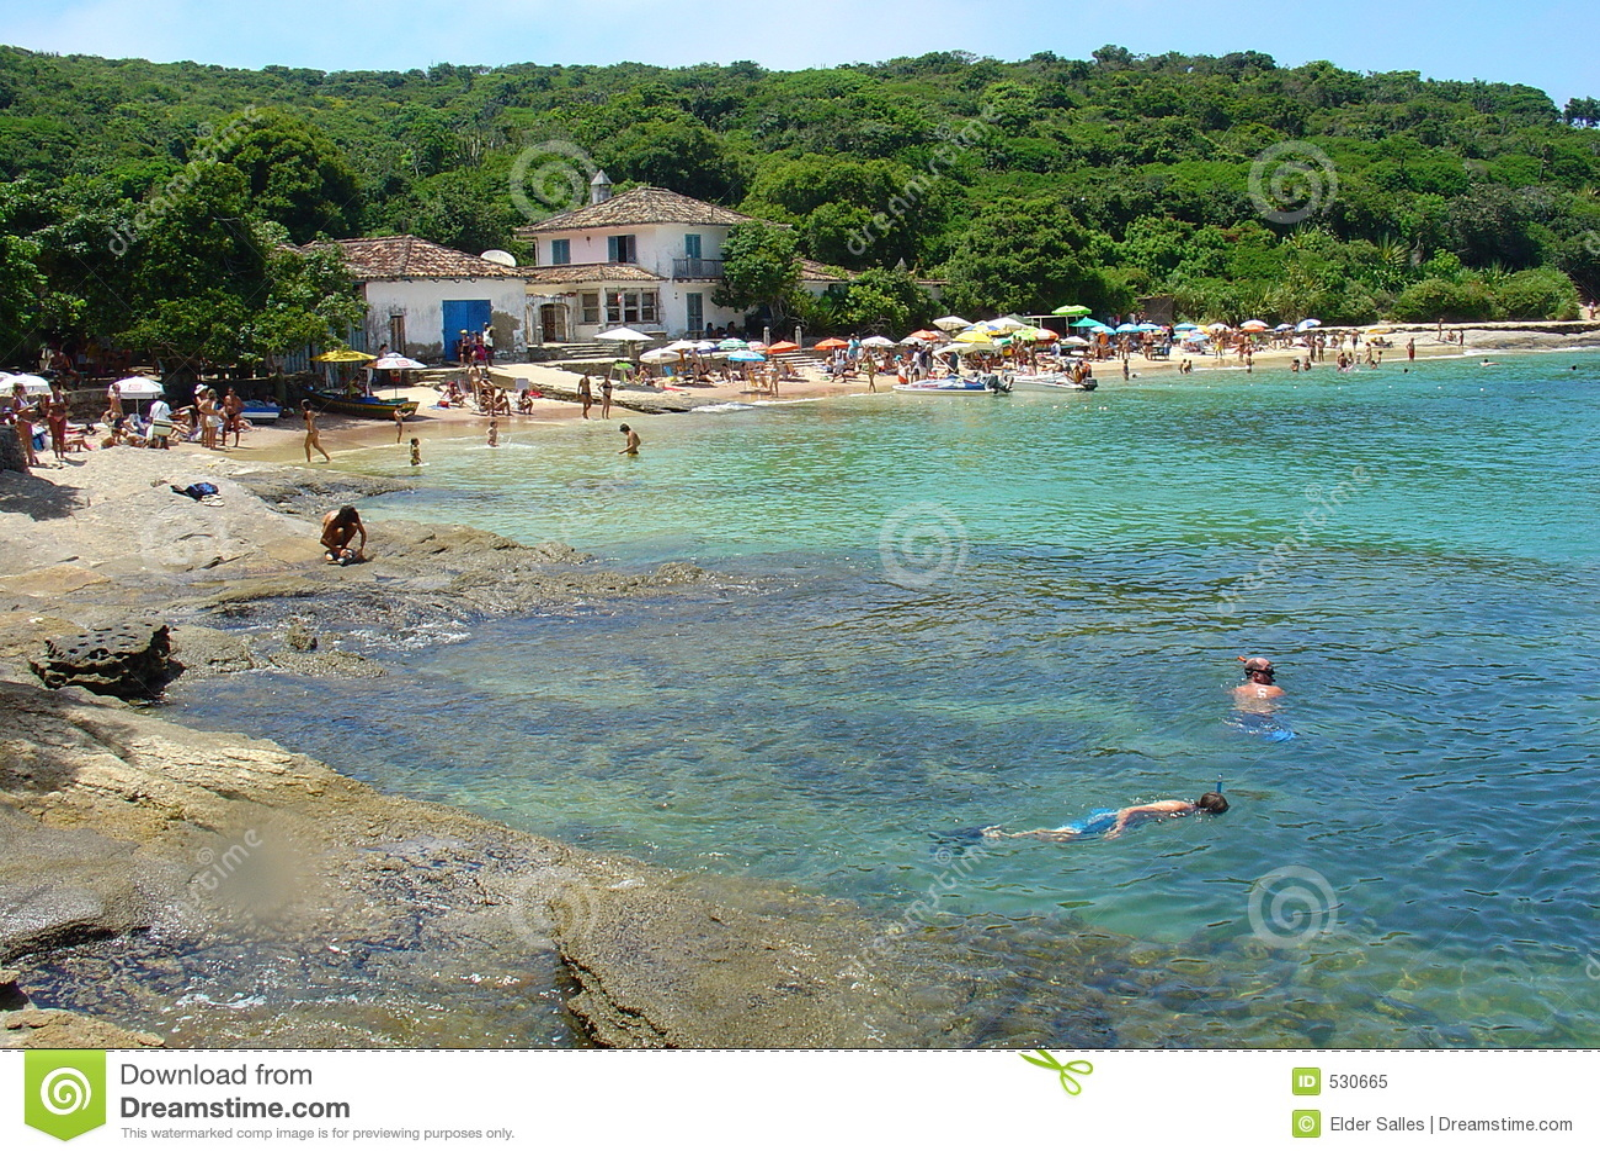 Download 海滩buzios假期 库存图片. 图片 包括有 震惊, 天堂, 作梦, 节假日, 横向, 游泳, 热带, 重新创建 - 530665